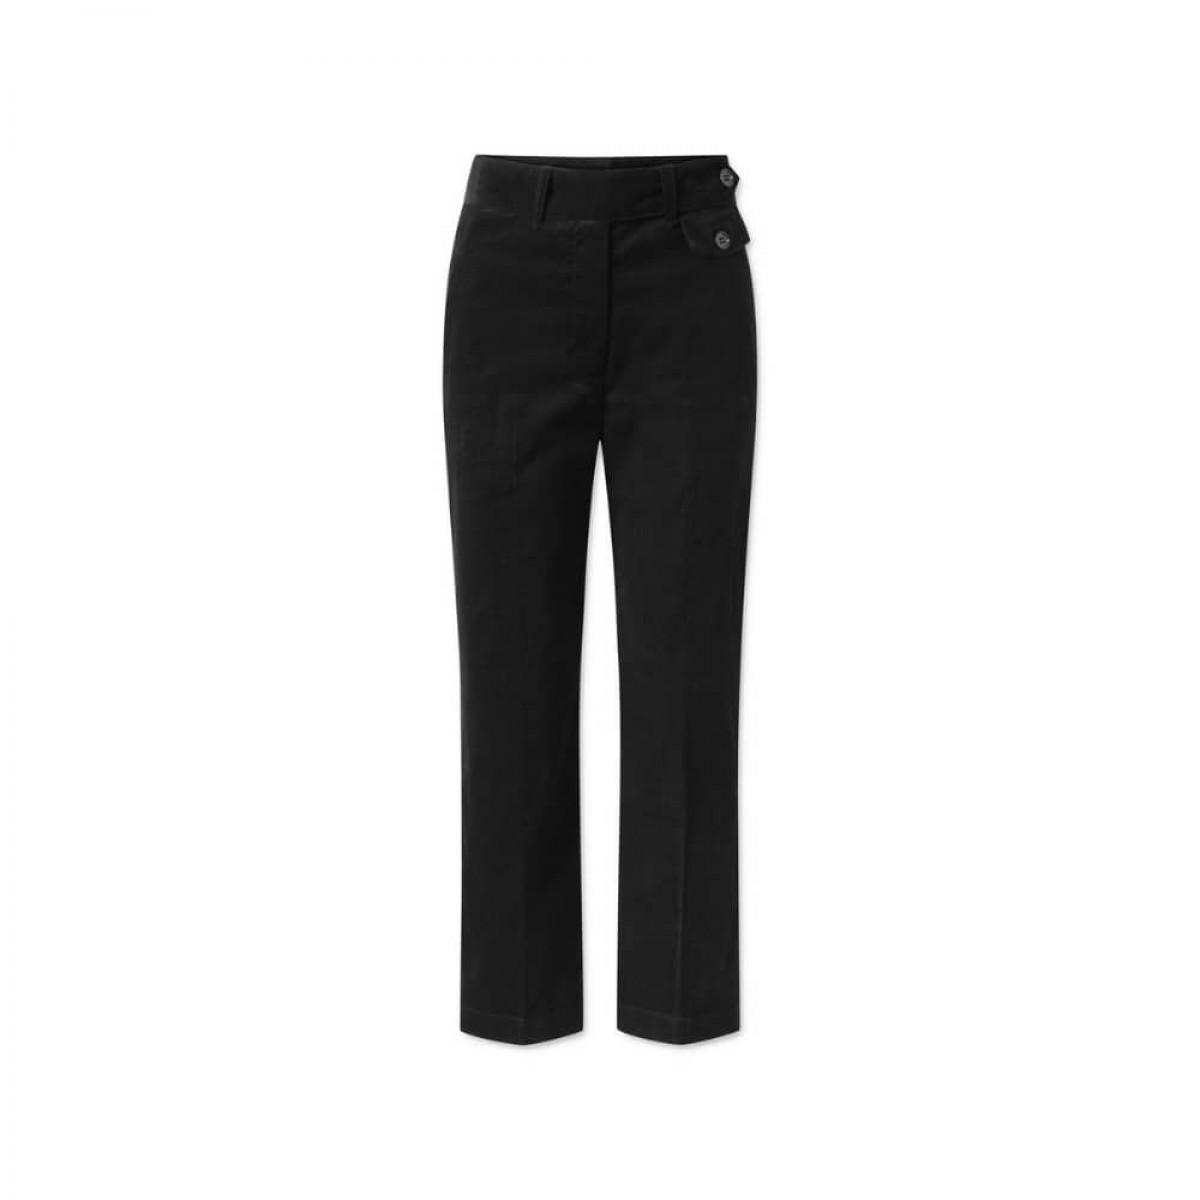 coppola pants - black fløjl - bagfra